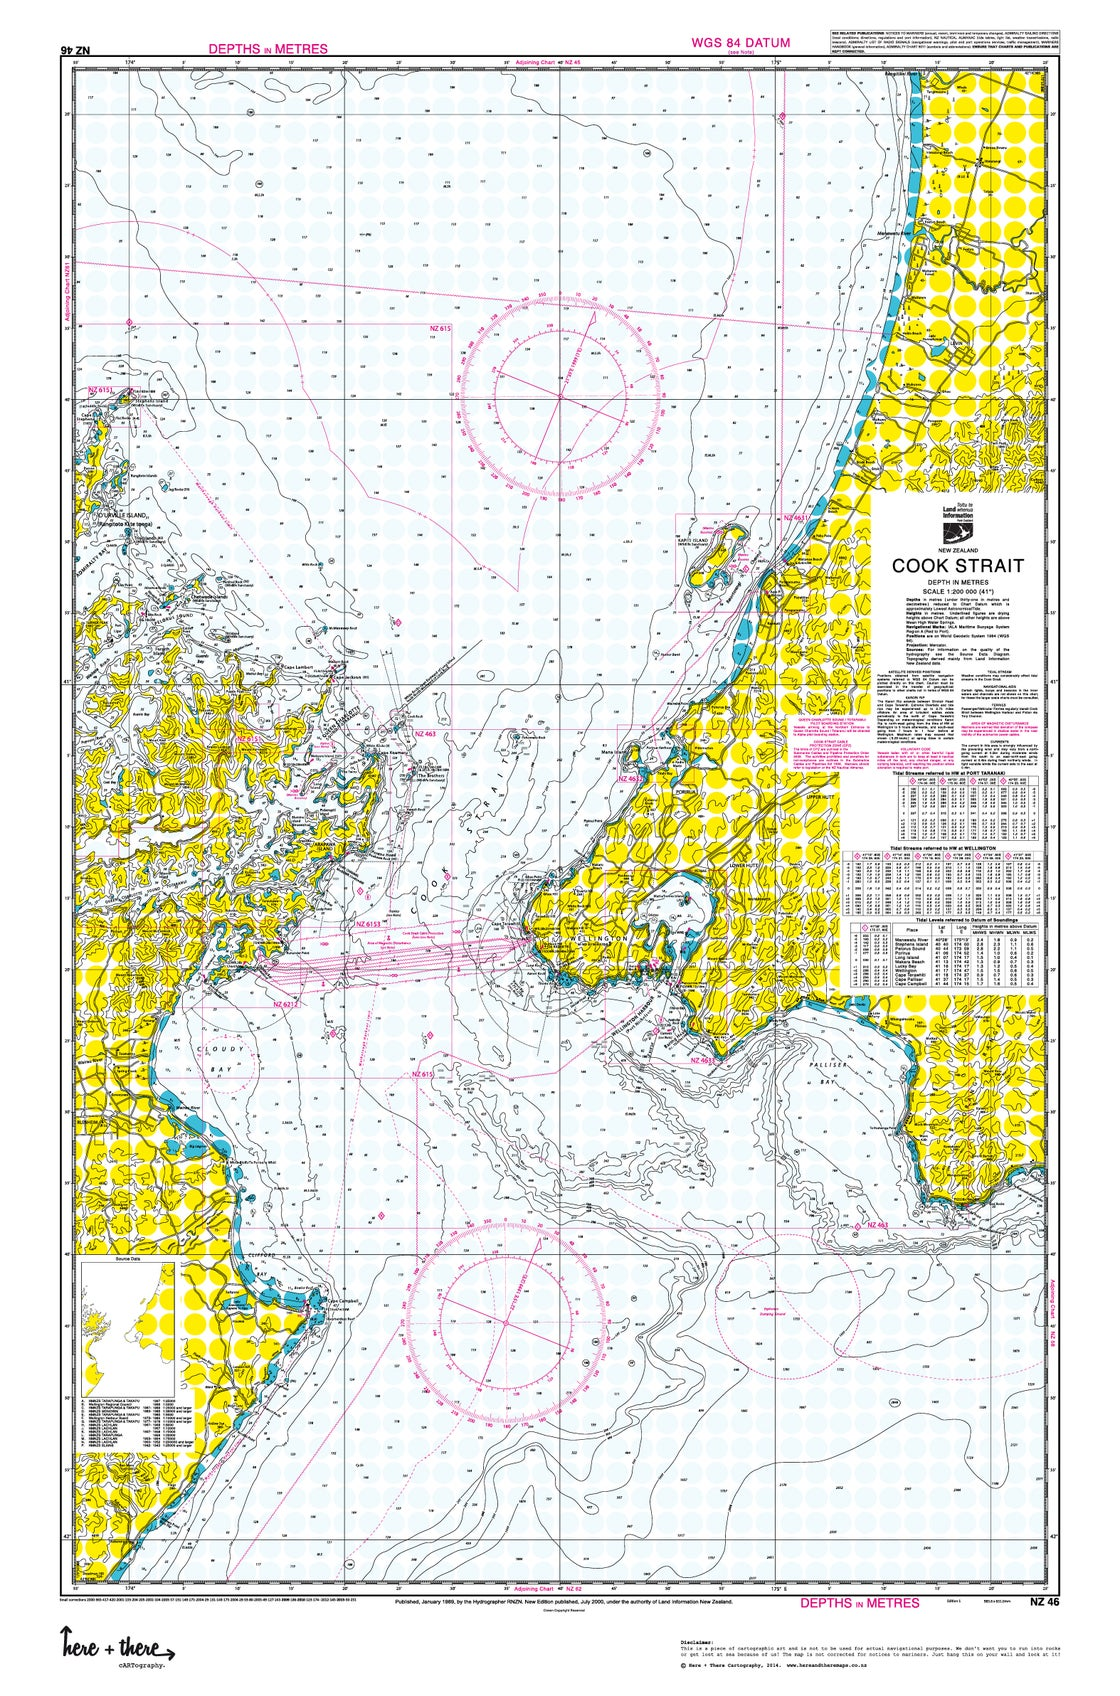 Image of Cook Strait - Yellow Polka